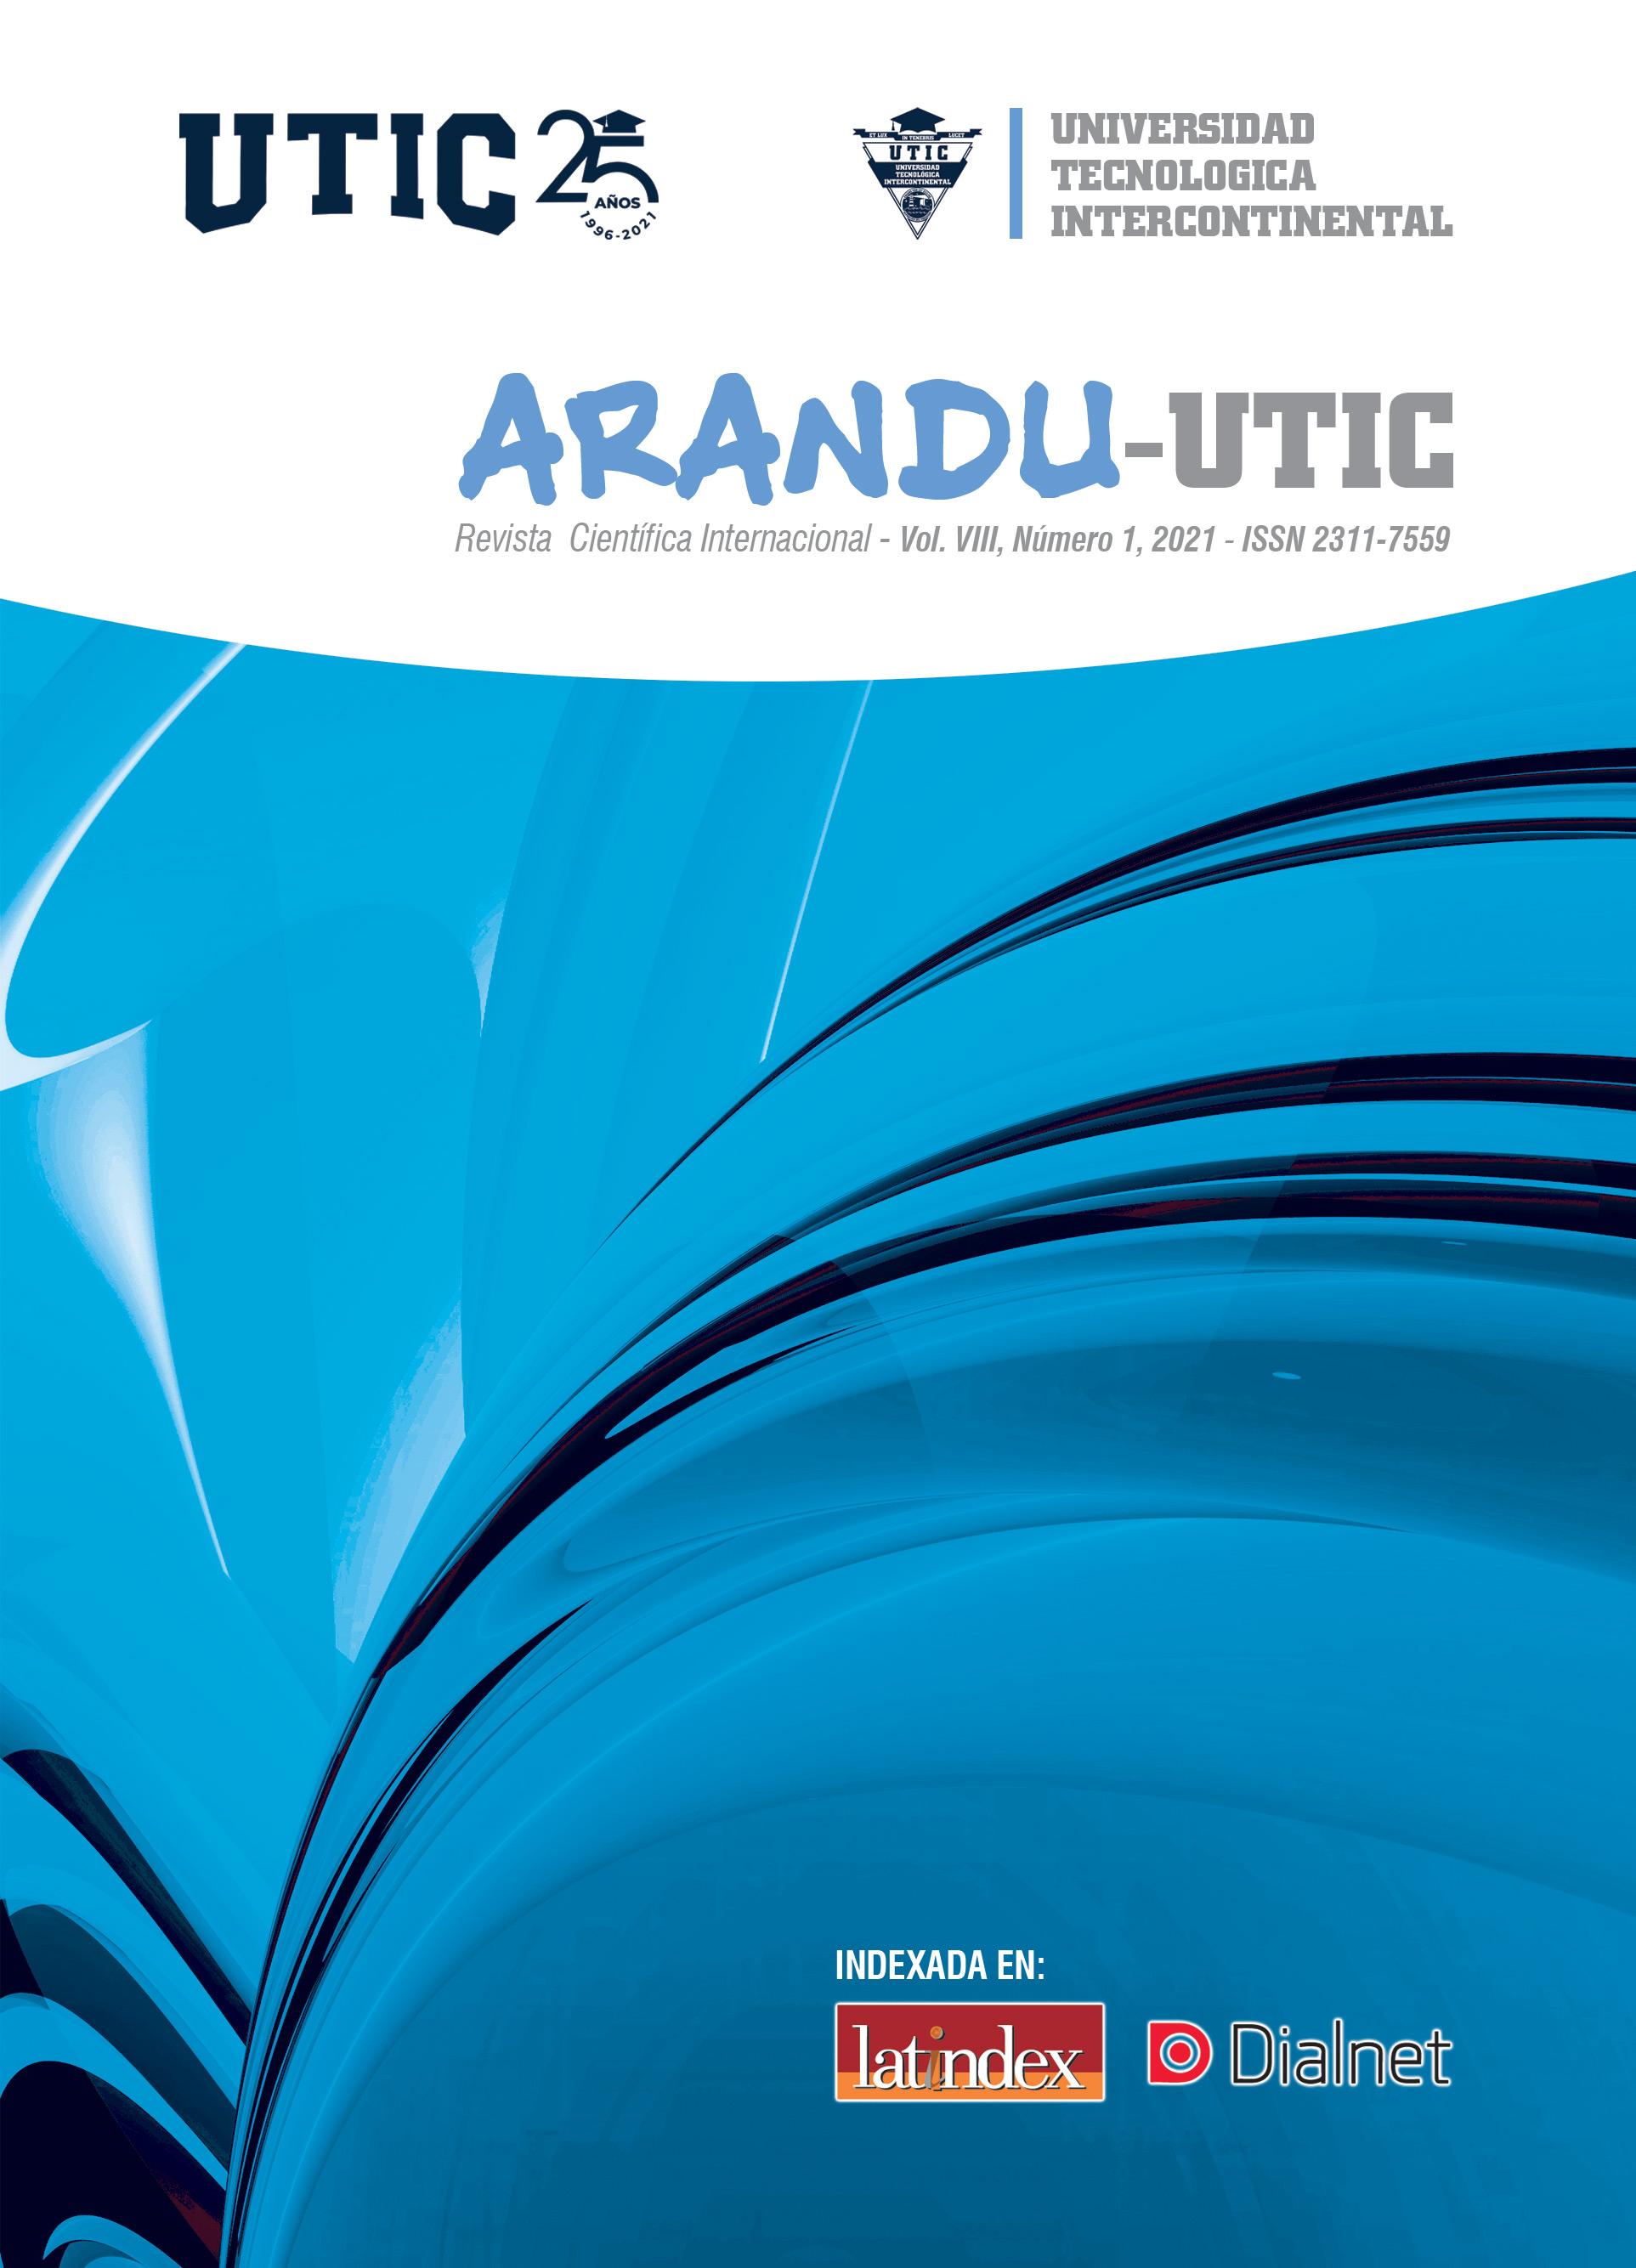 Ver Vol. 8 Núm. 1 (2021): Arandu UTIC